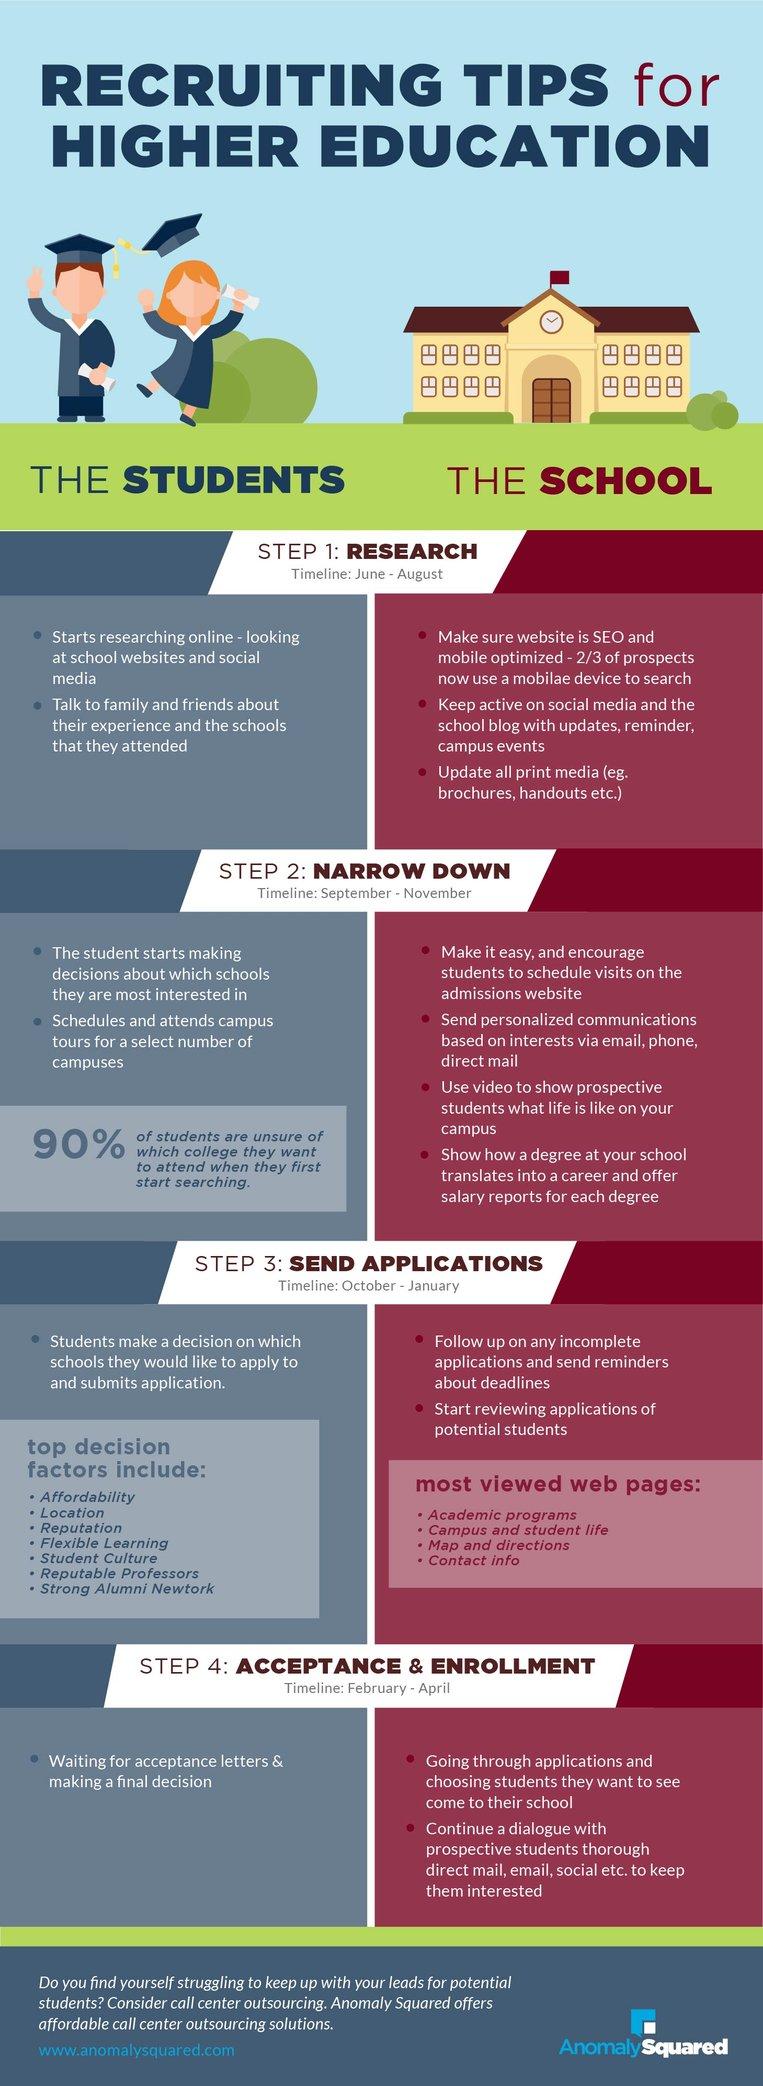 Higher Ed Recruiting _Infographic-02.jpg